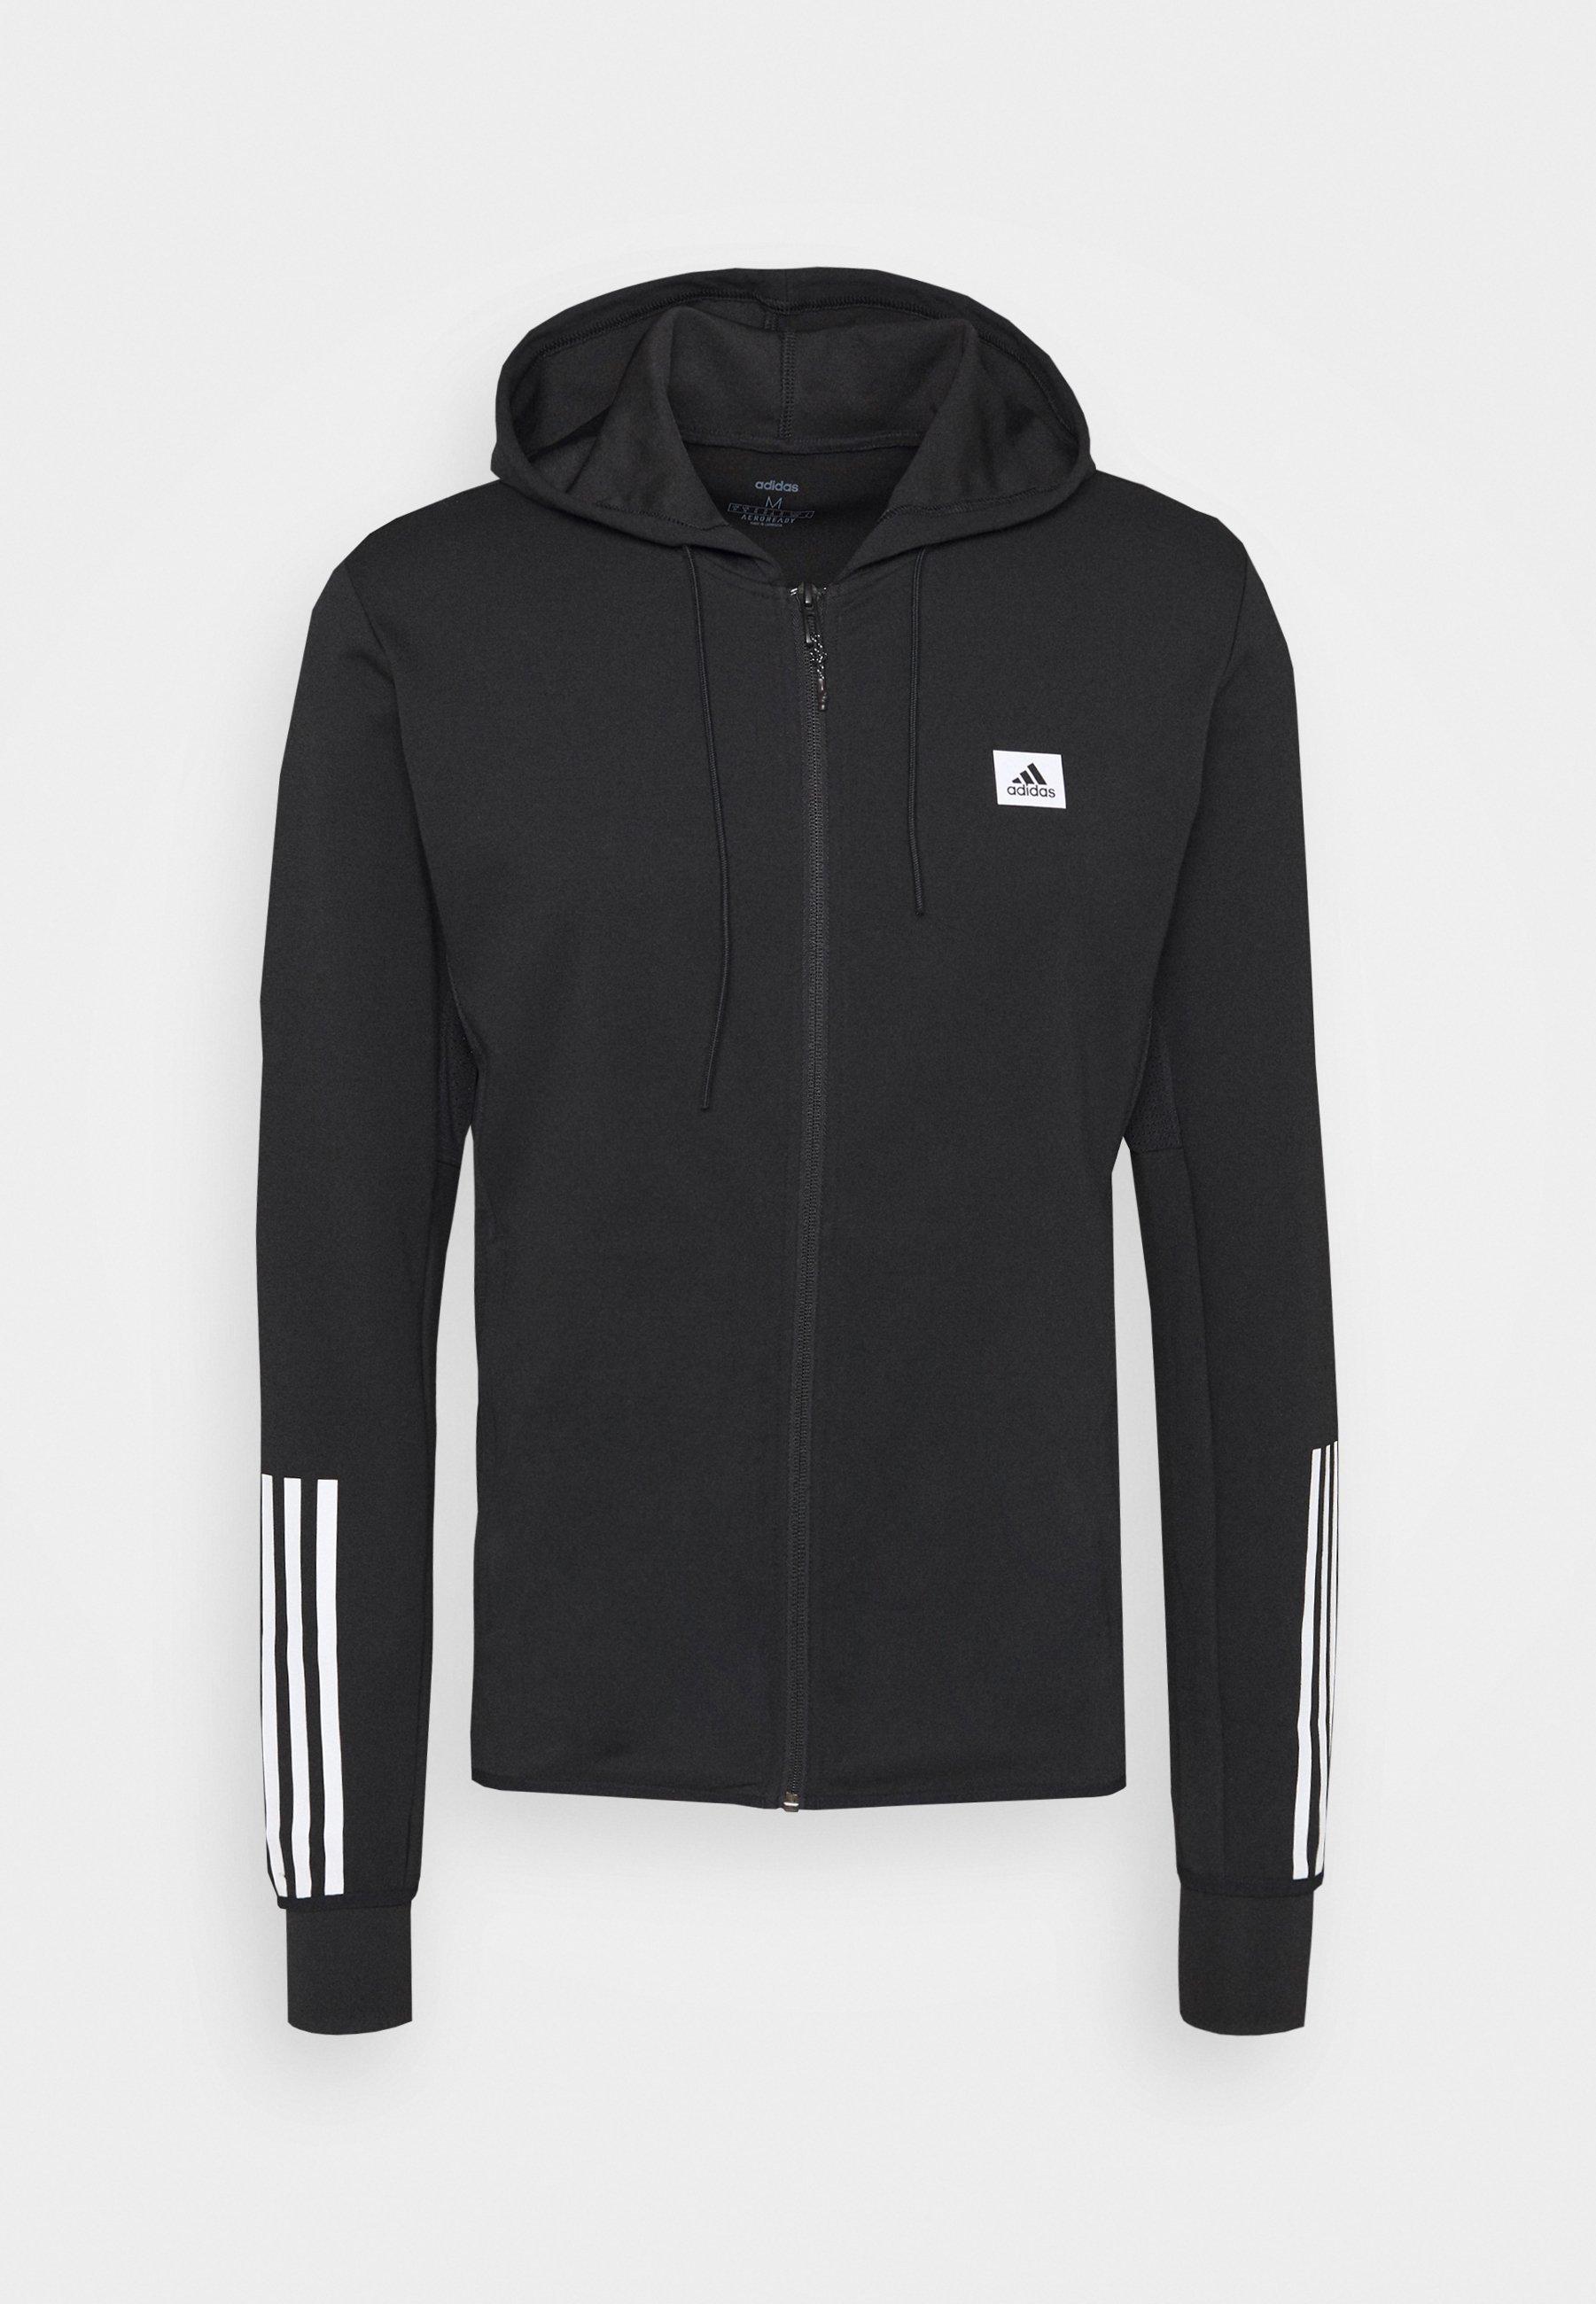 Adidas Sport jacket jacke Hoodie Schwarz Baumwolle Track